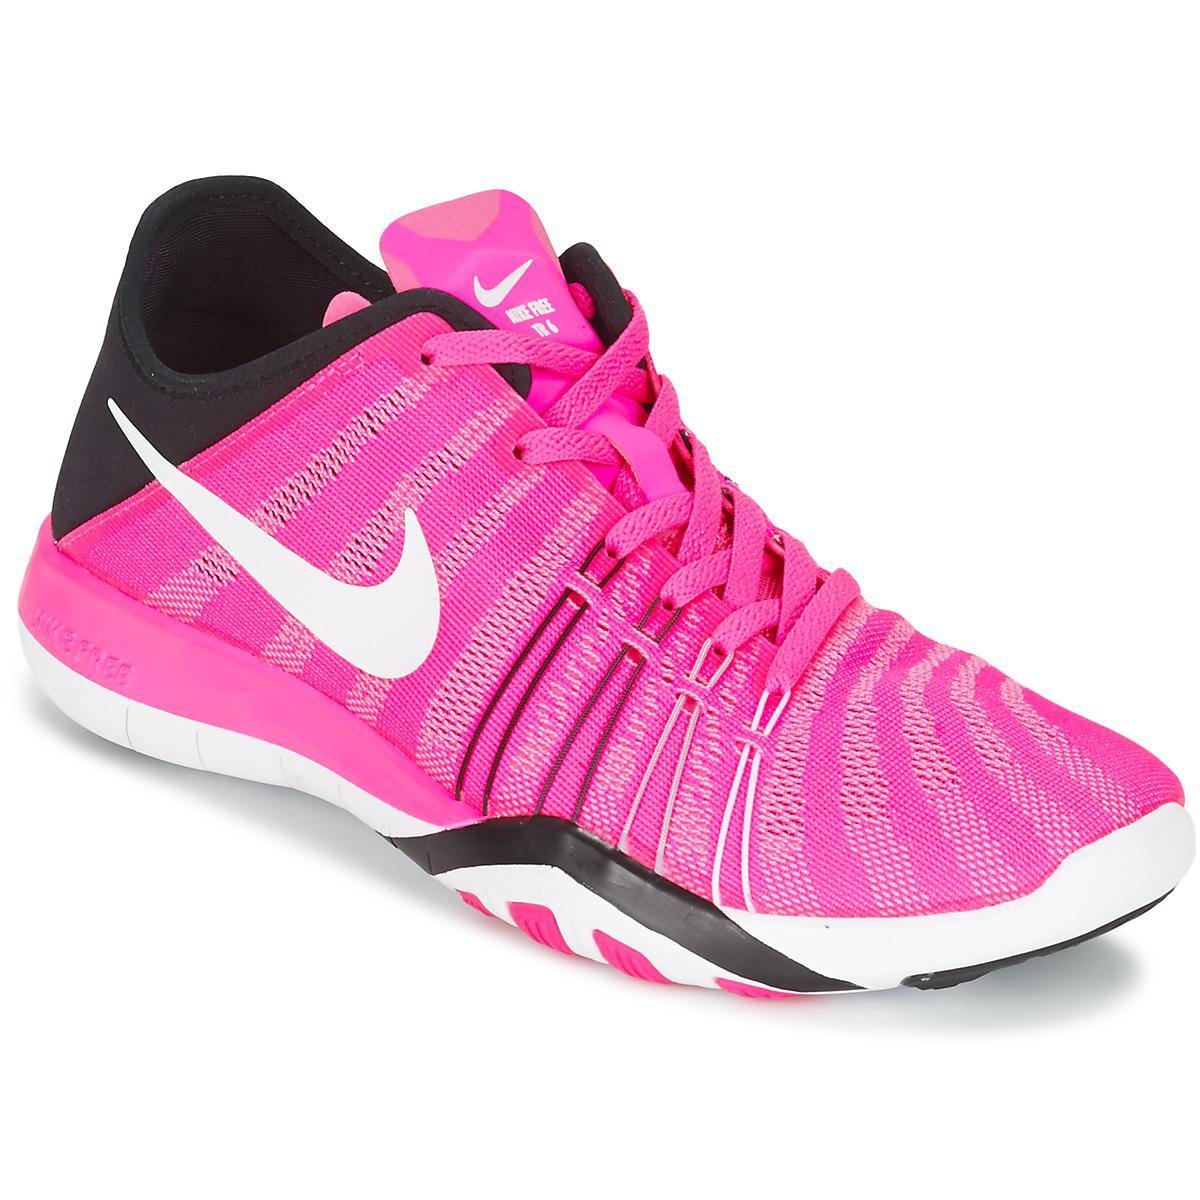 d91f1868e7a45 ... switzerland nike. womens pink free trainer e066b 93232